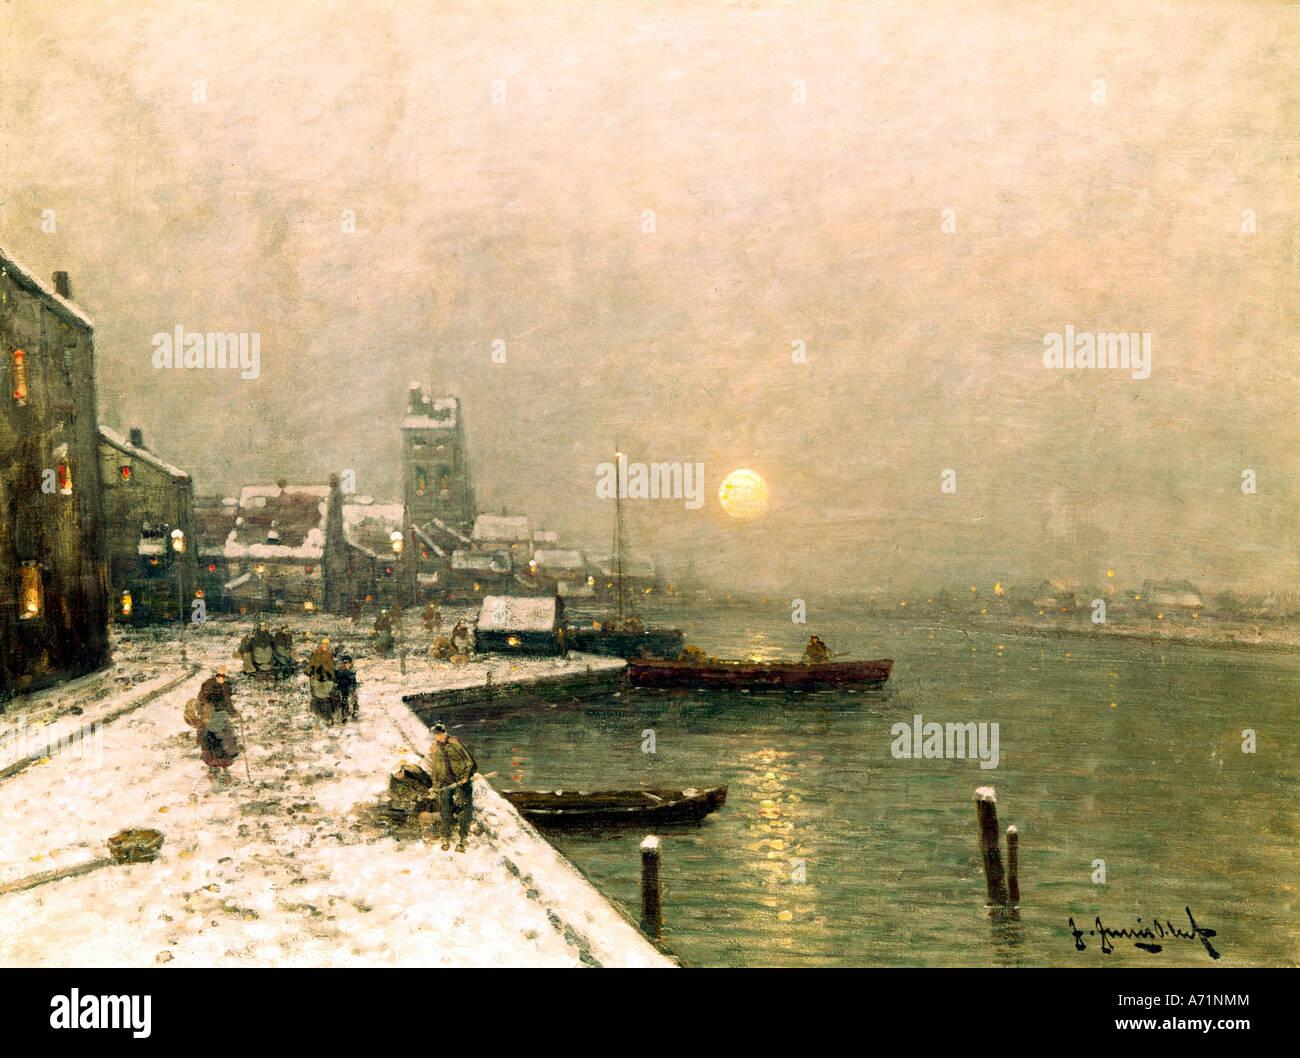 'Fine Arts, Jungblut, Johann, (1860 - 1912), peinture, 'l'Hiver à Düsseldorf', galerie Photo Stock